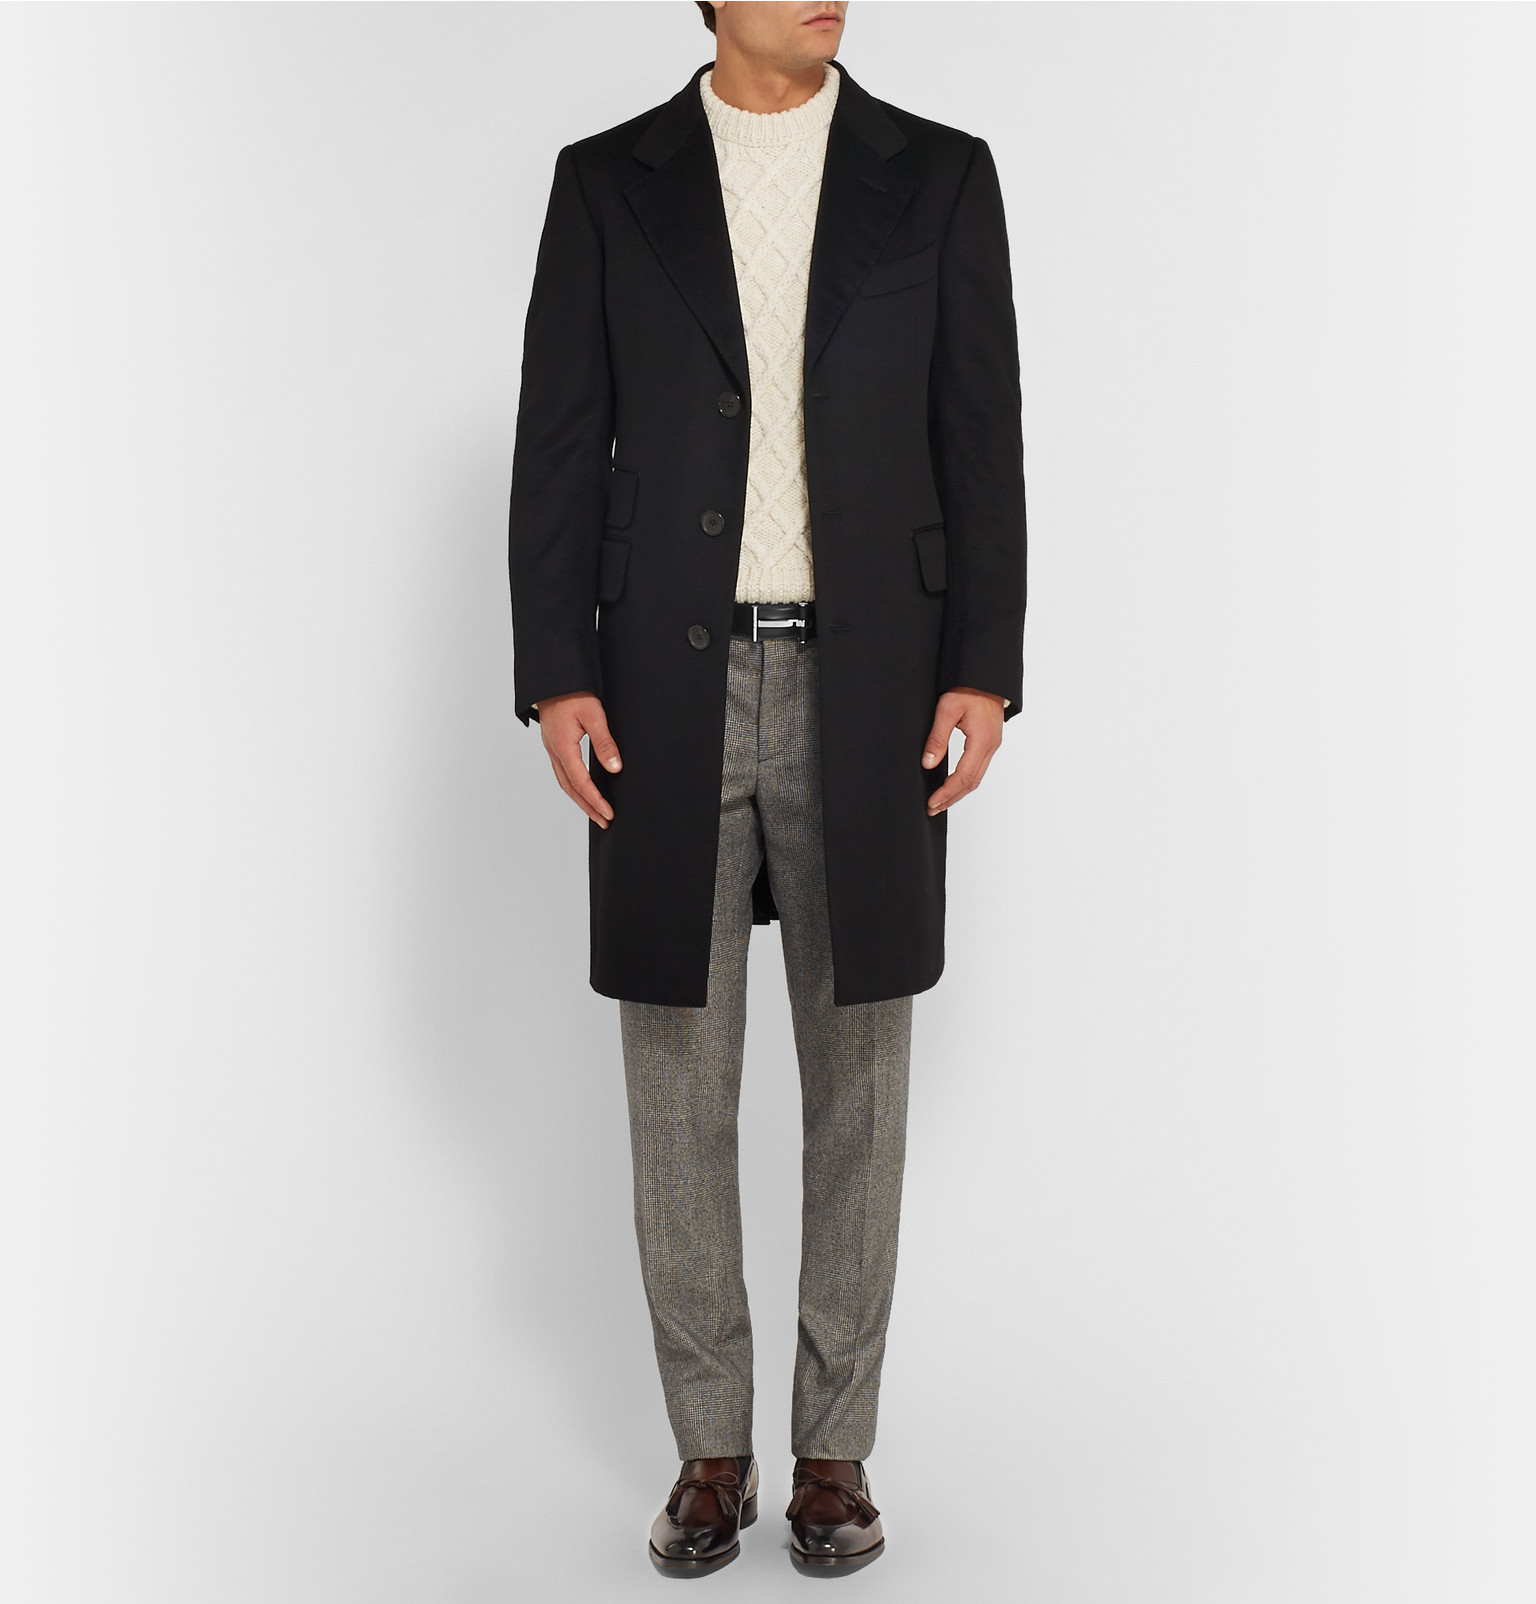 78a381e51 Tom Ford 4cm Black Leather Belt in Black for Men - Lyst